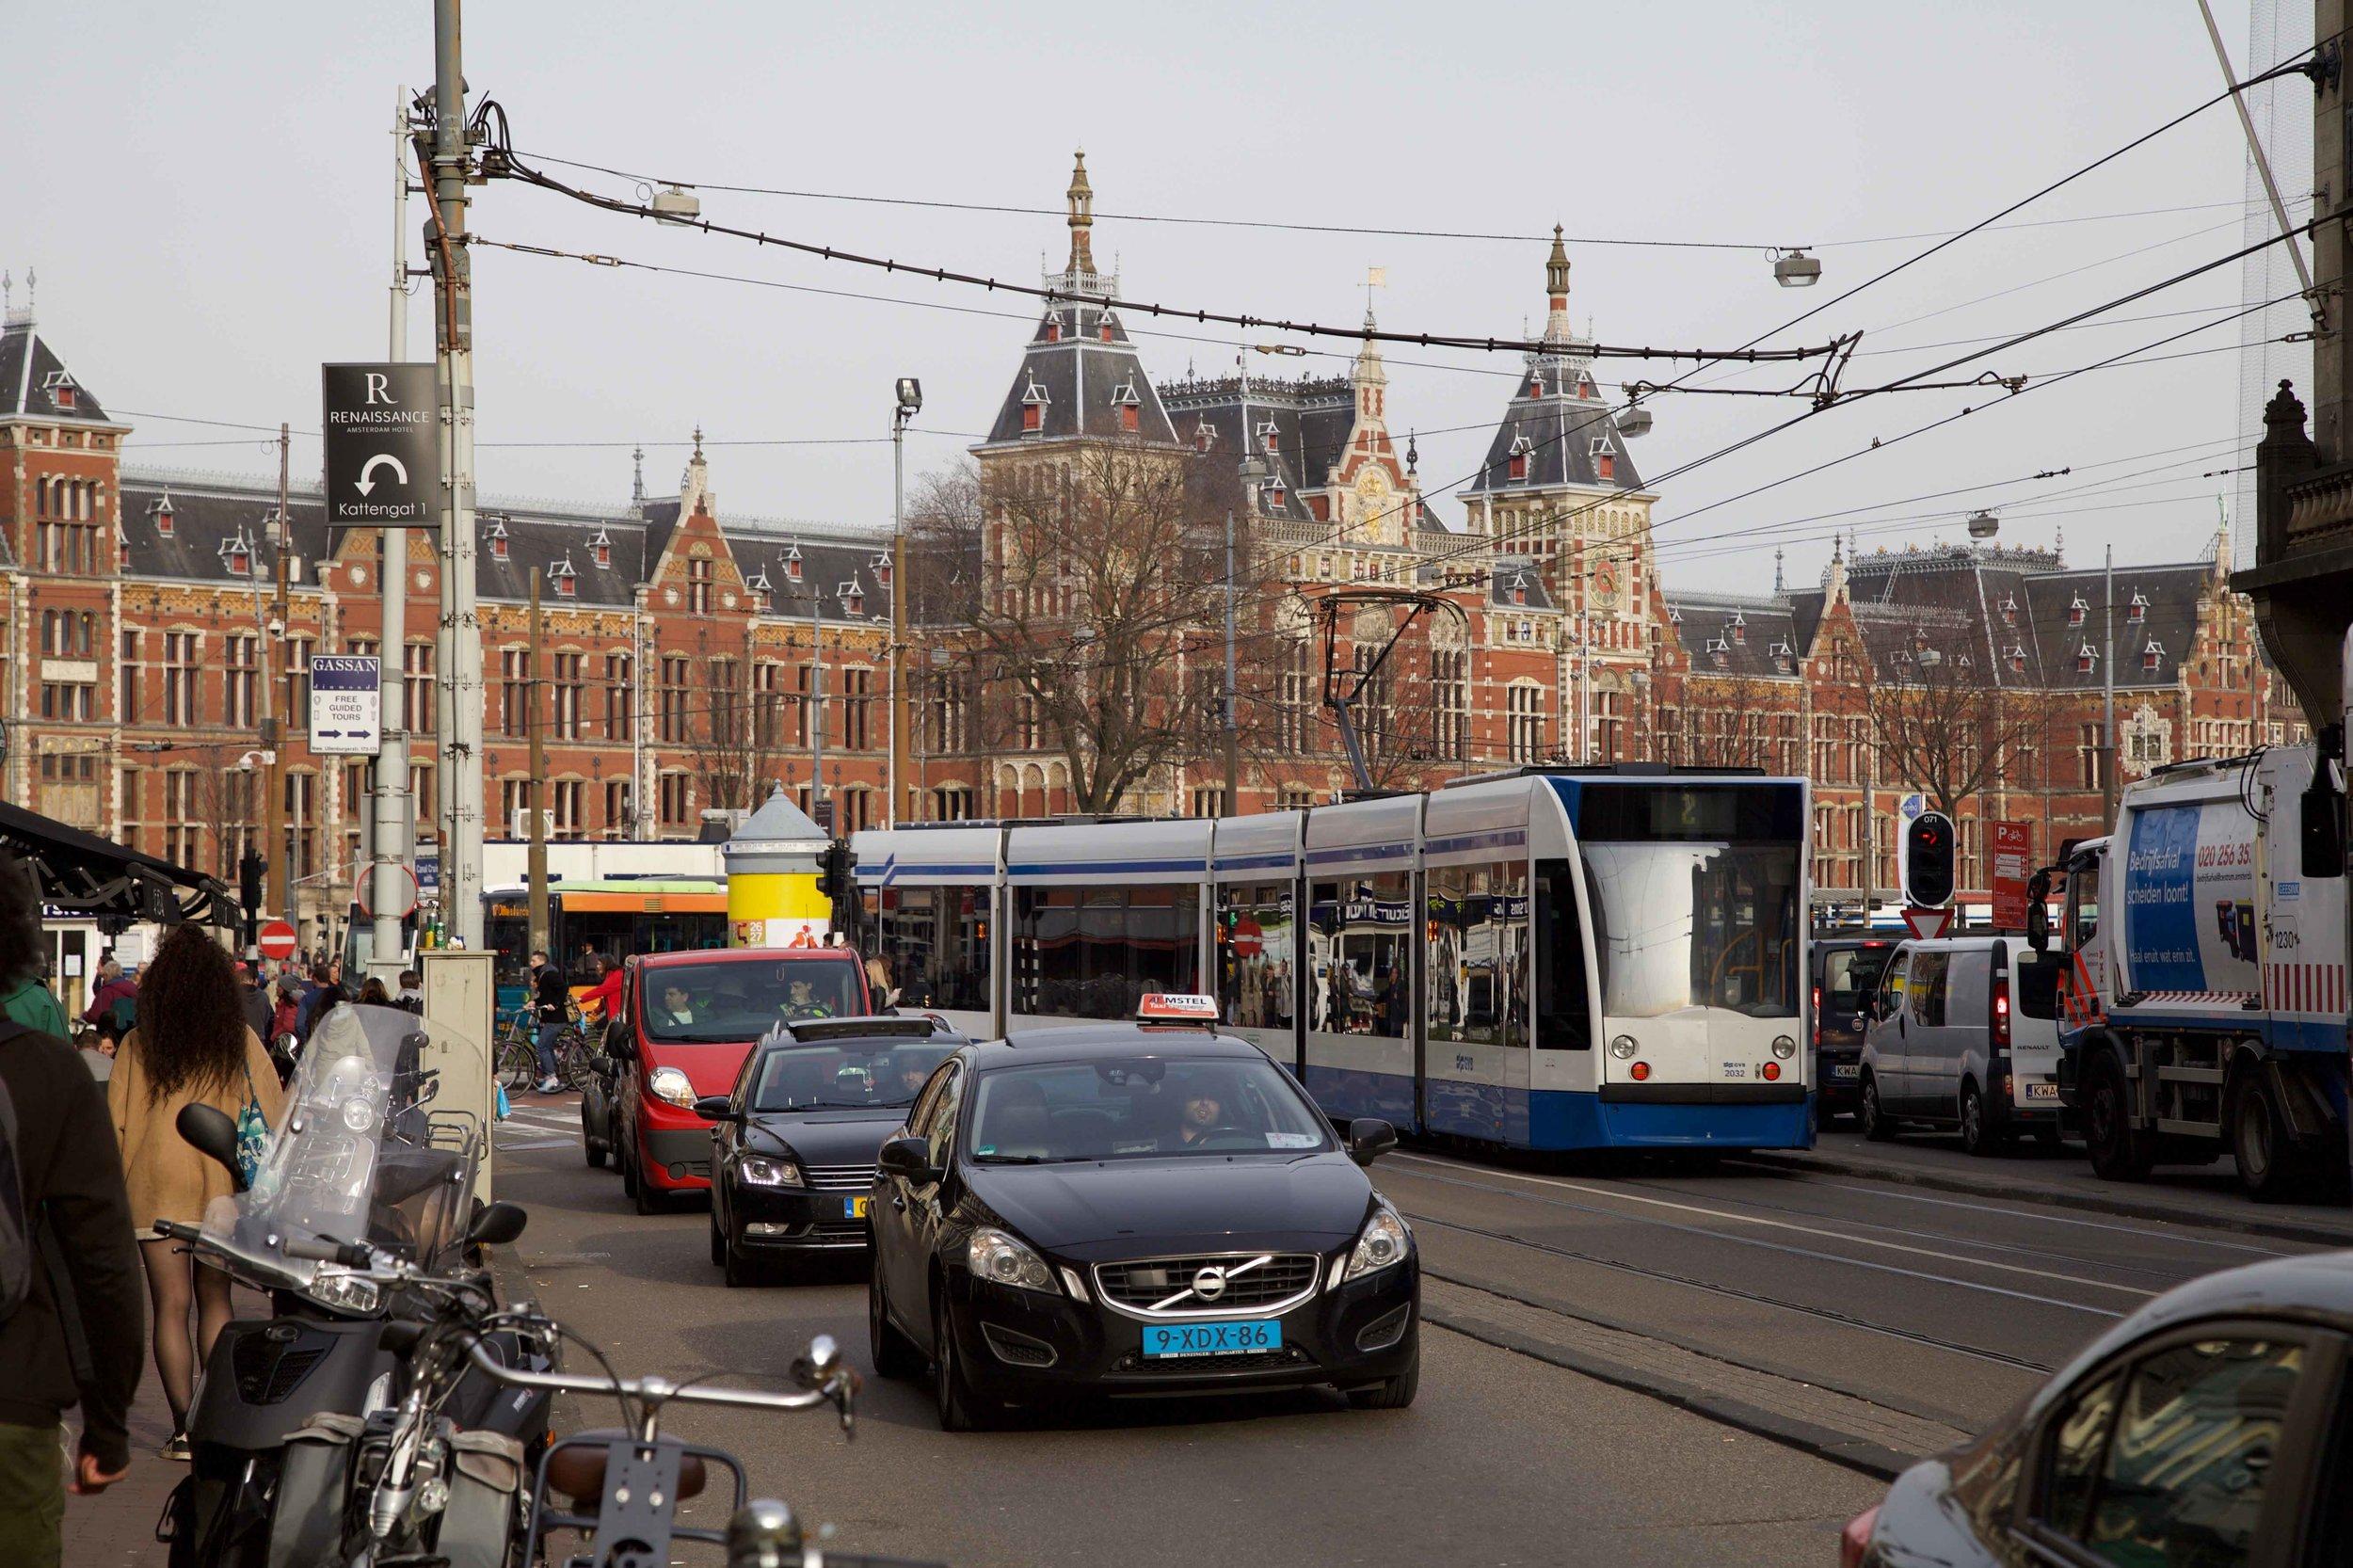 Amsterdam central station,Amsterdam. Photo: Fabio Ricci. Image©thingstodot.com